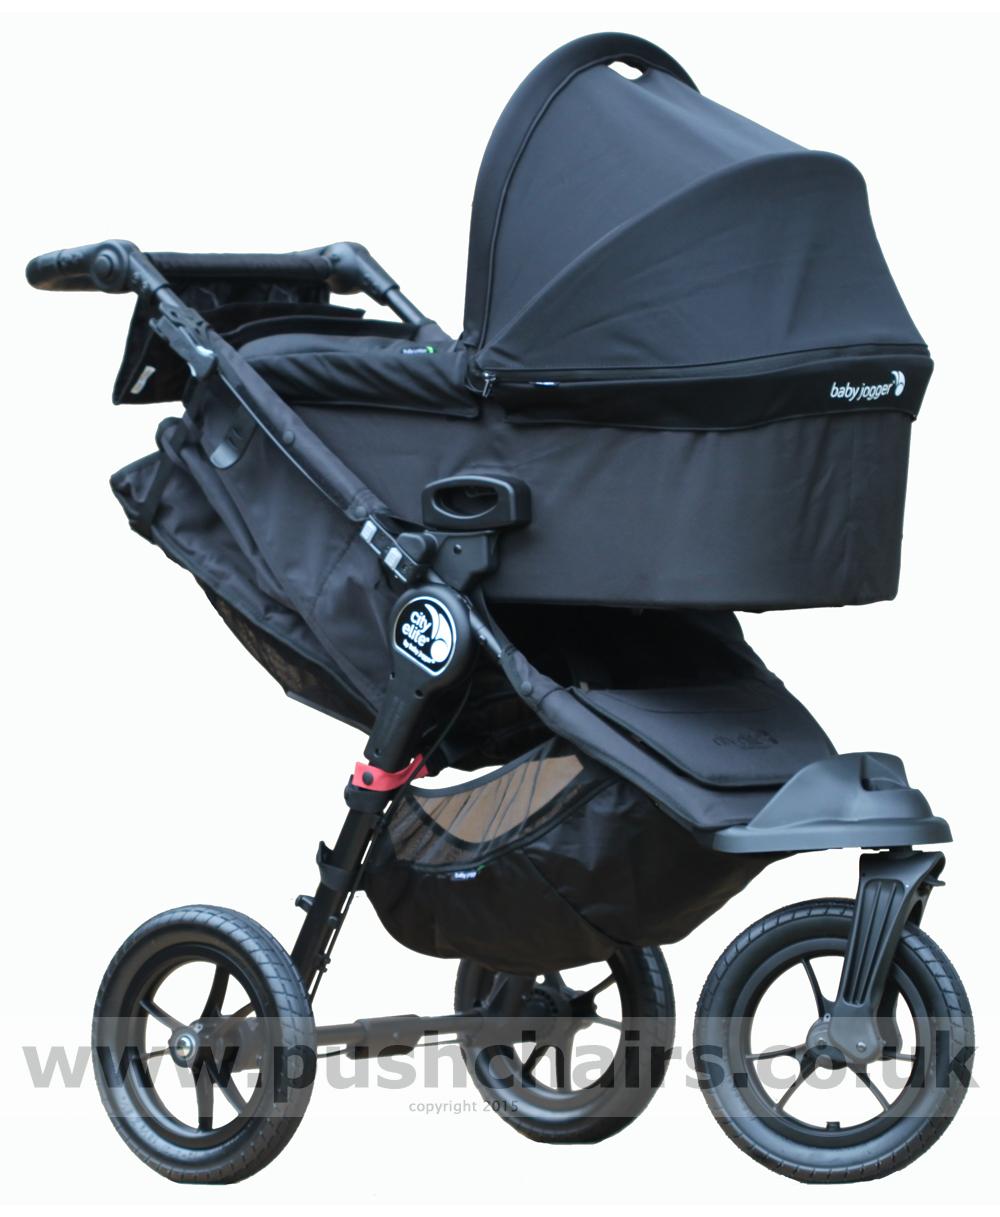 Orchard Farm Ltd Baby Jogger City Elite Black Inc Rain Cover